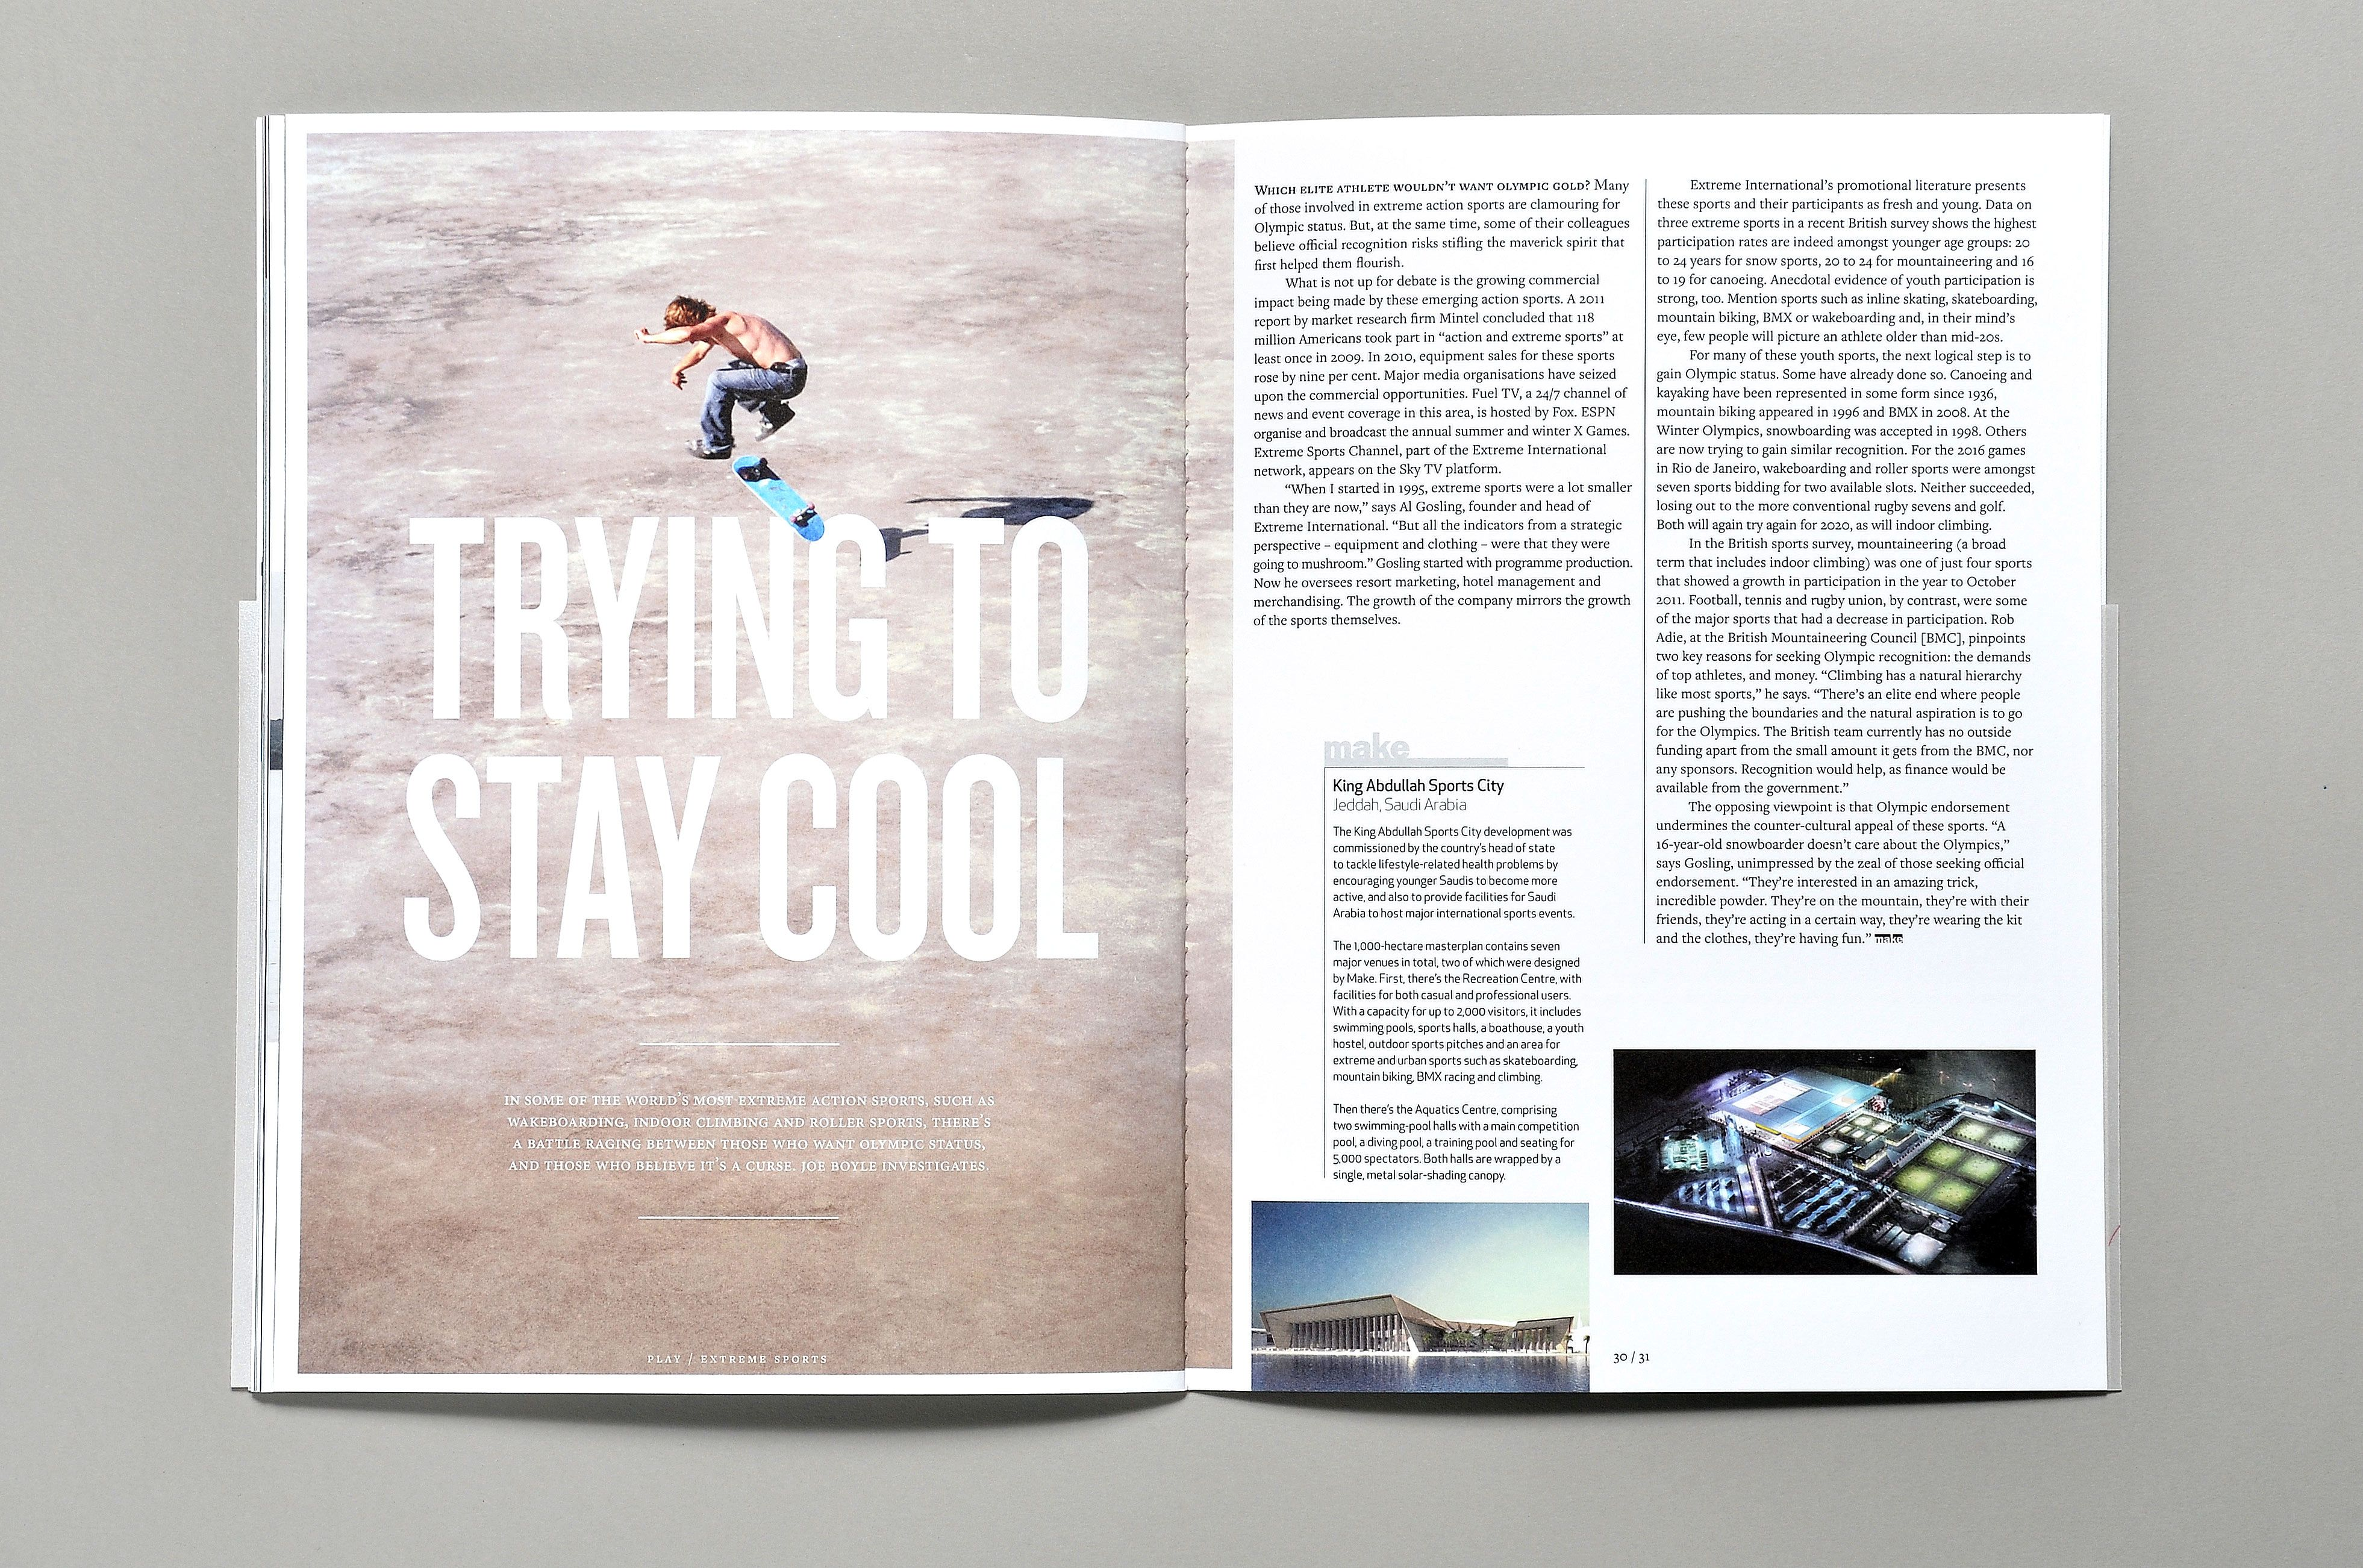 Pin By Becca Setala On Magazine Magazine Layout Text Over Photo Magazine Spreads